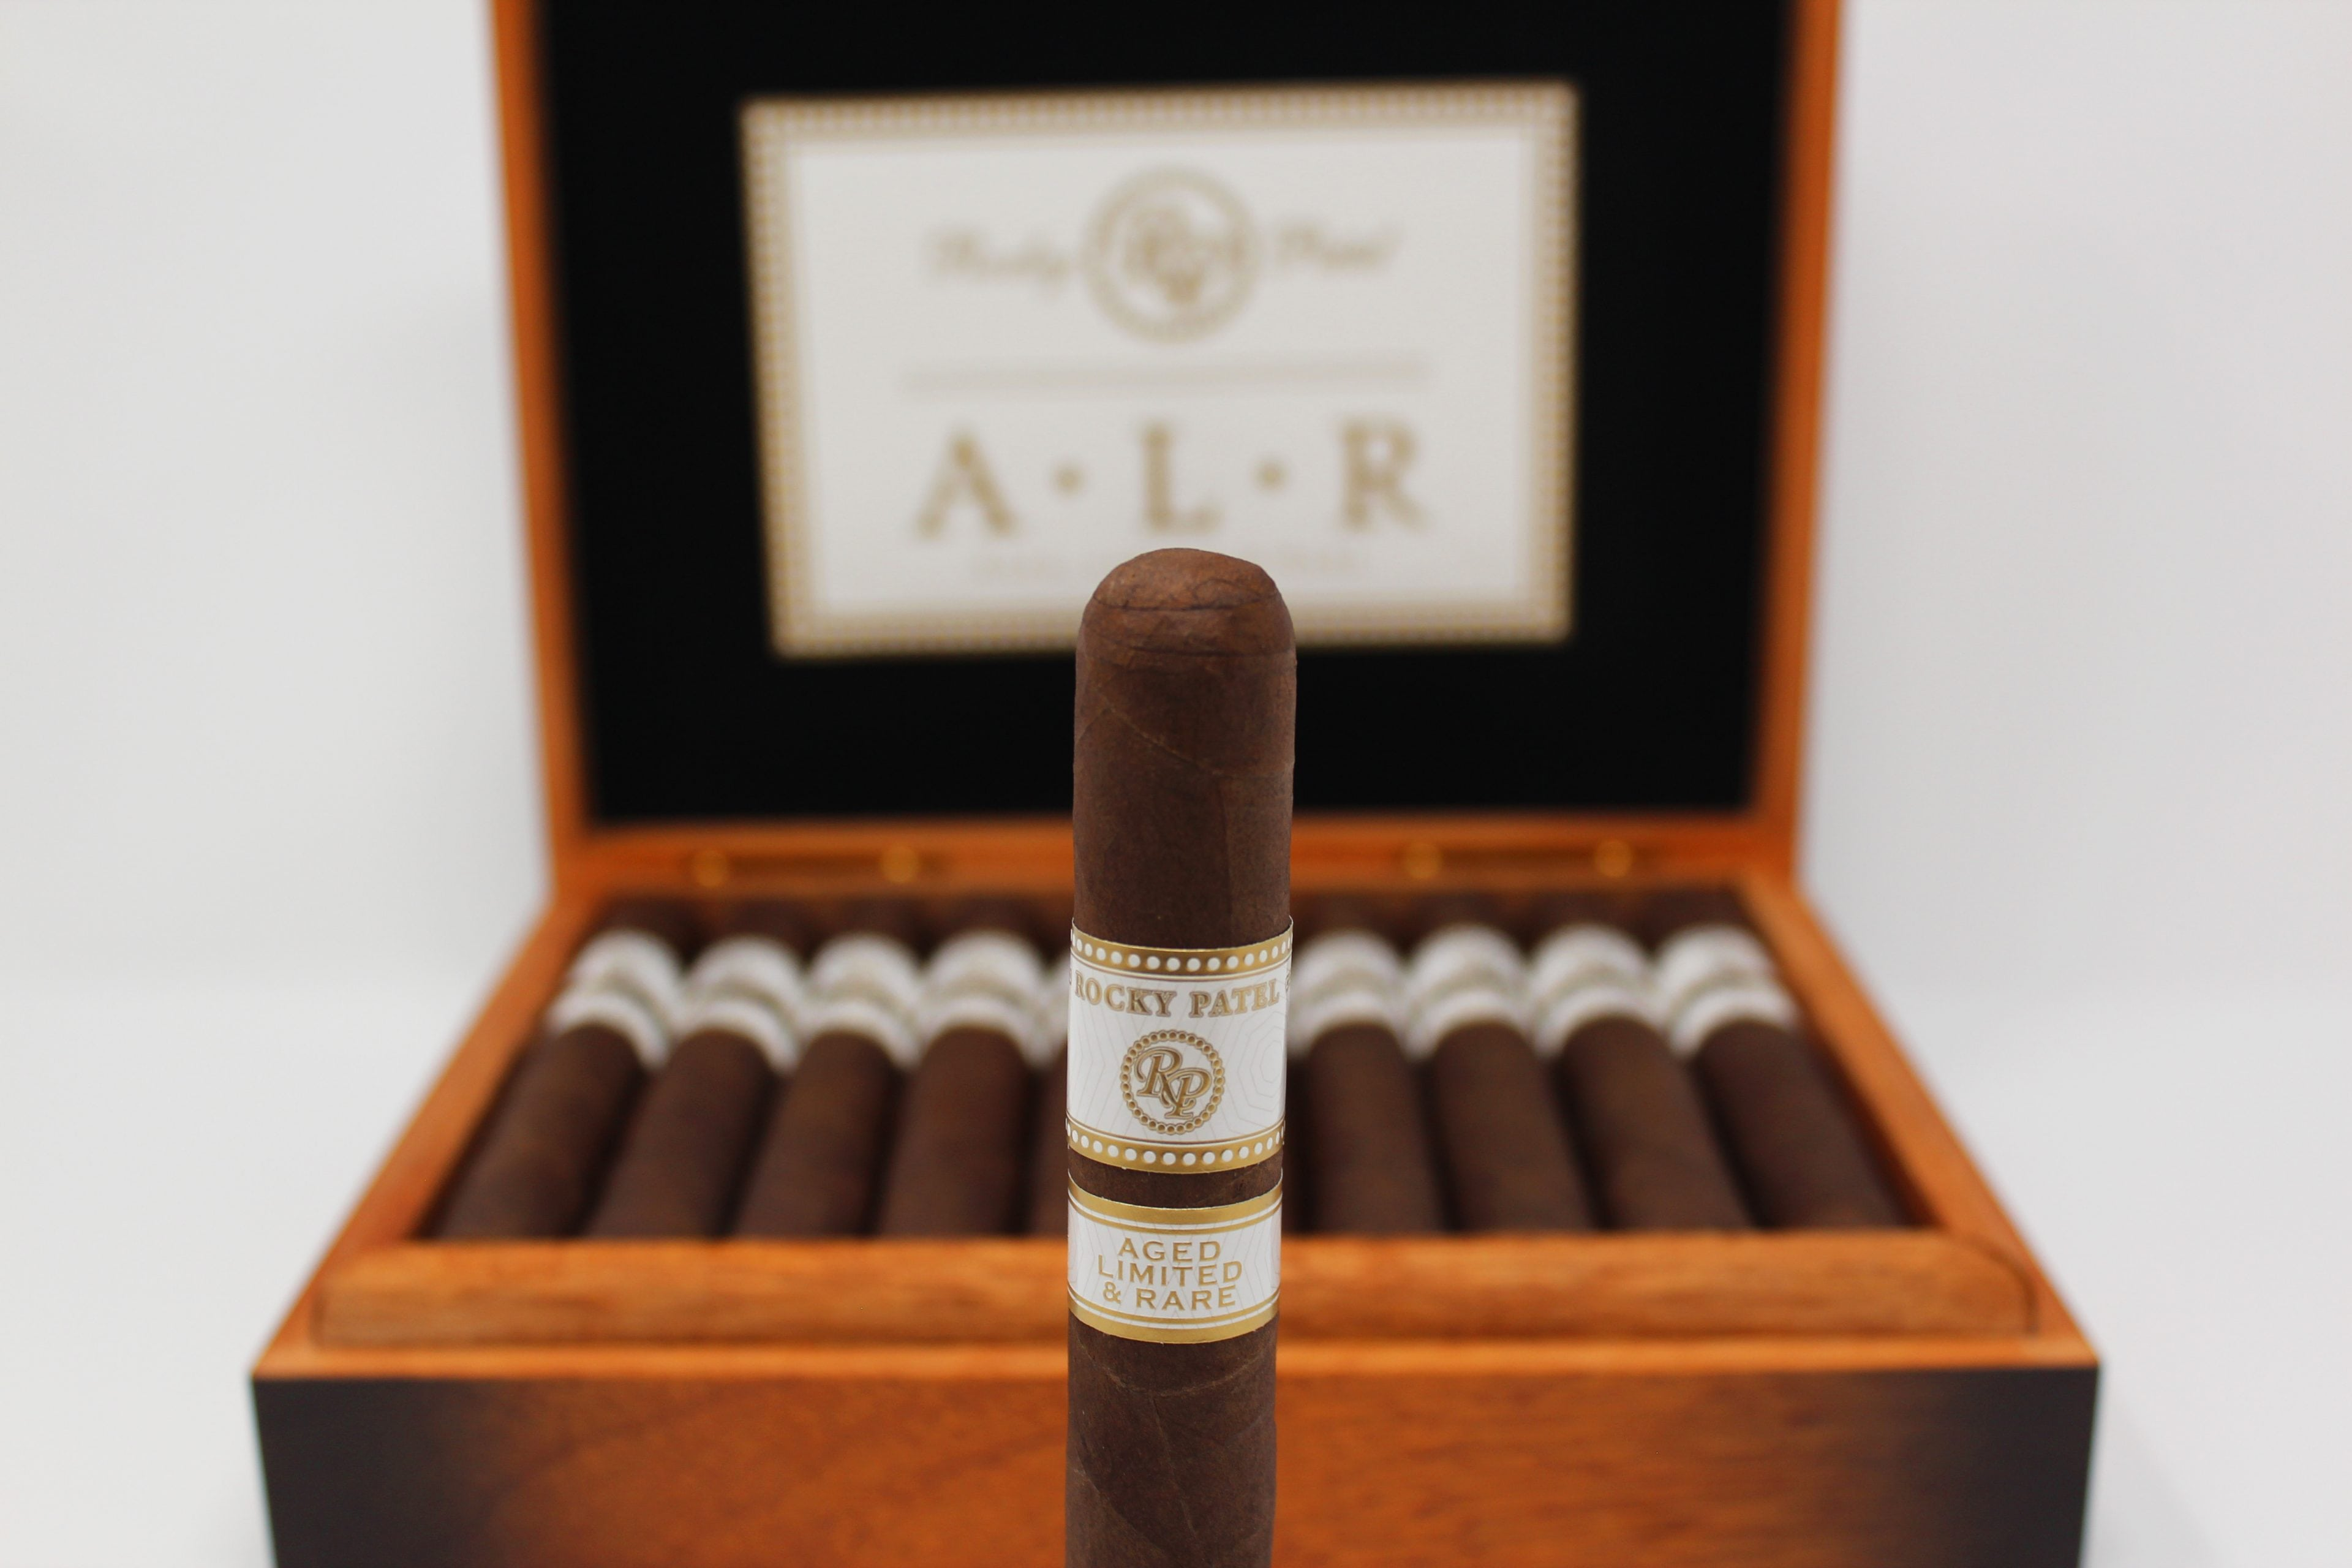 Cigar News: Rocky Patel Announces ALR